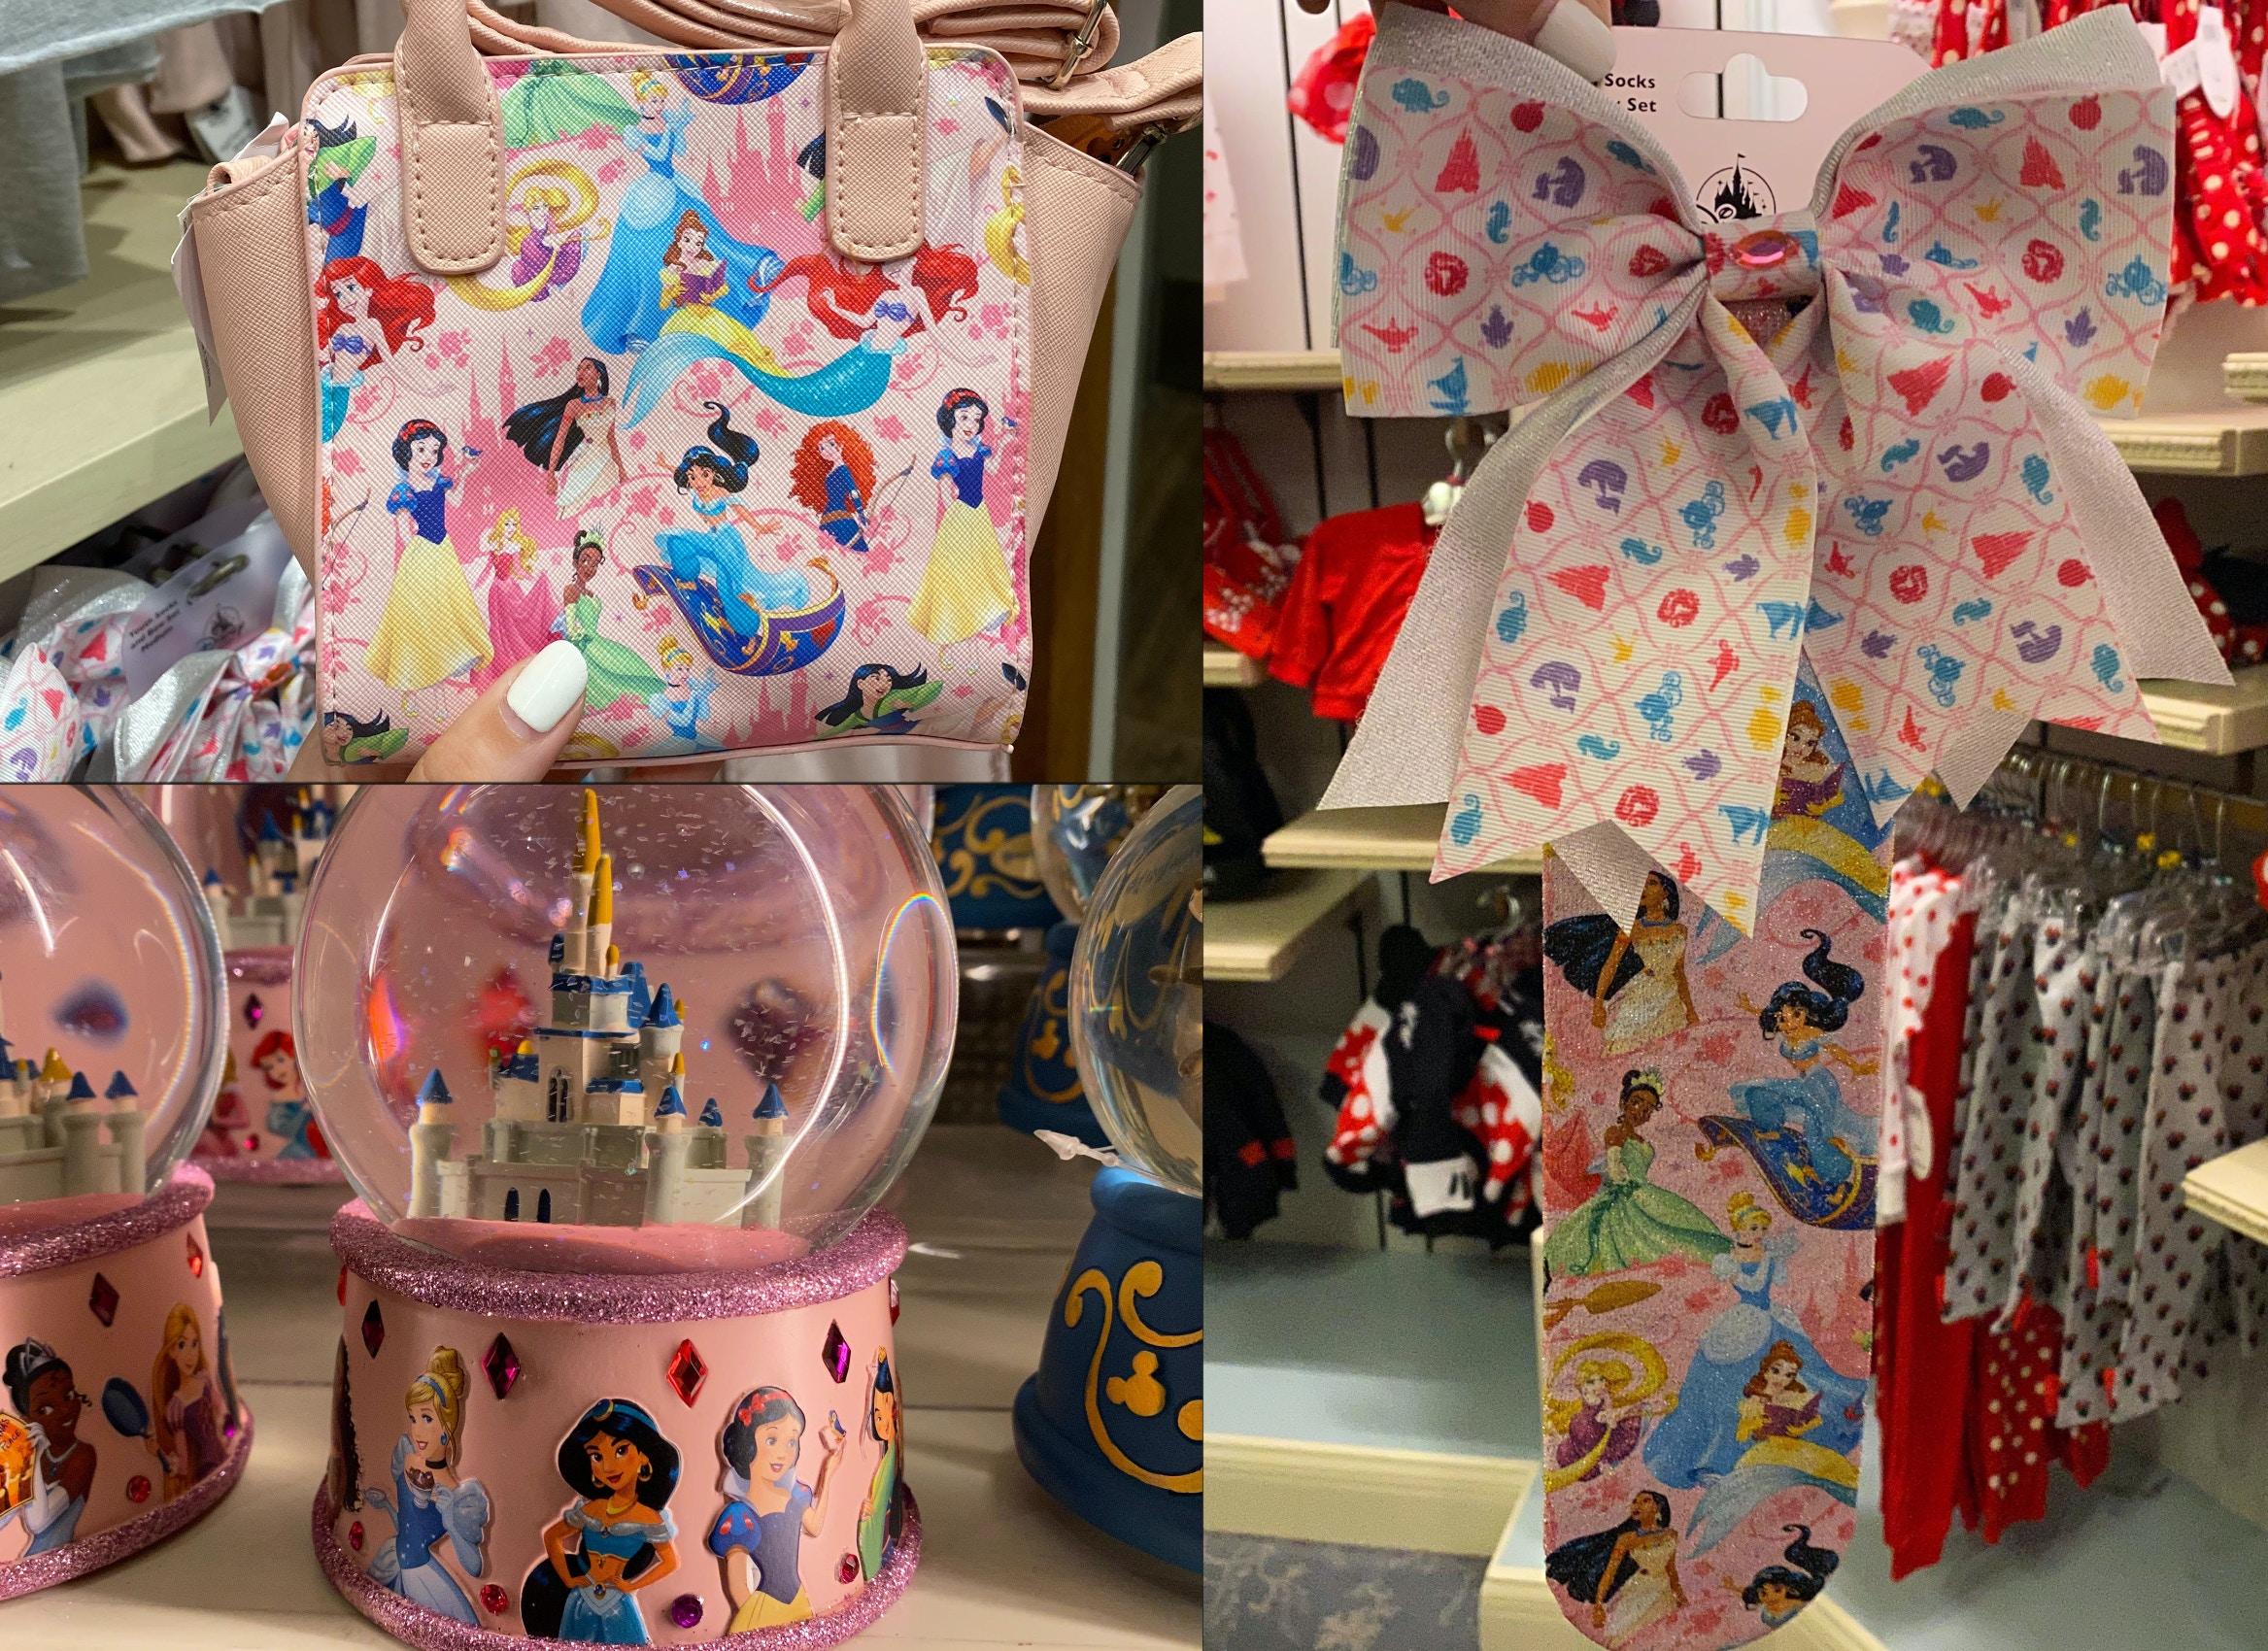 disneyland-kids-princess-collage-02-16-2020.jpg